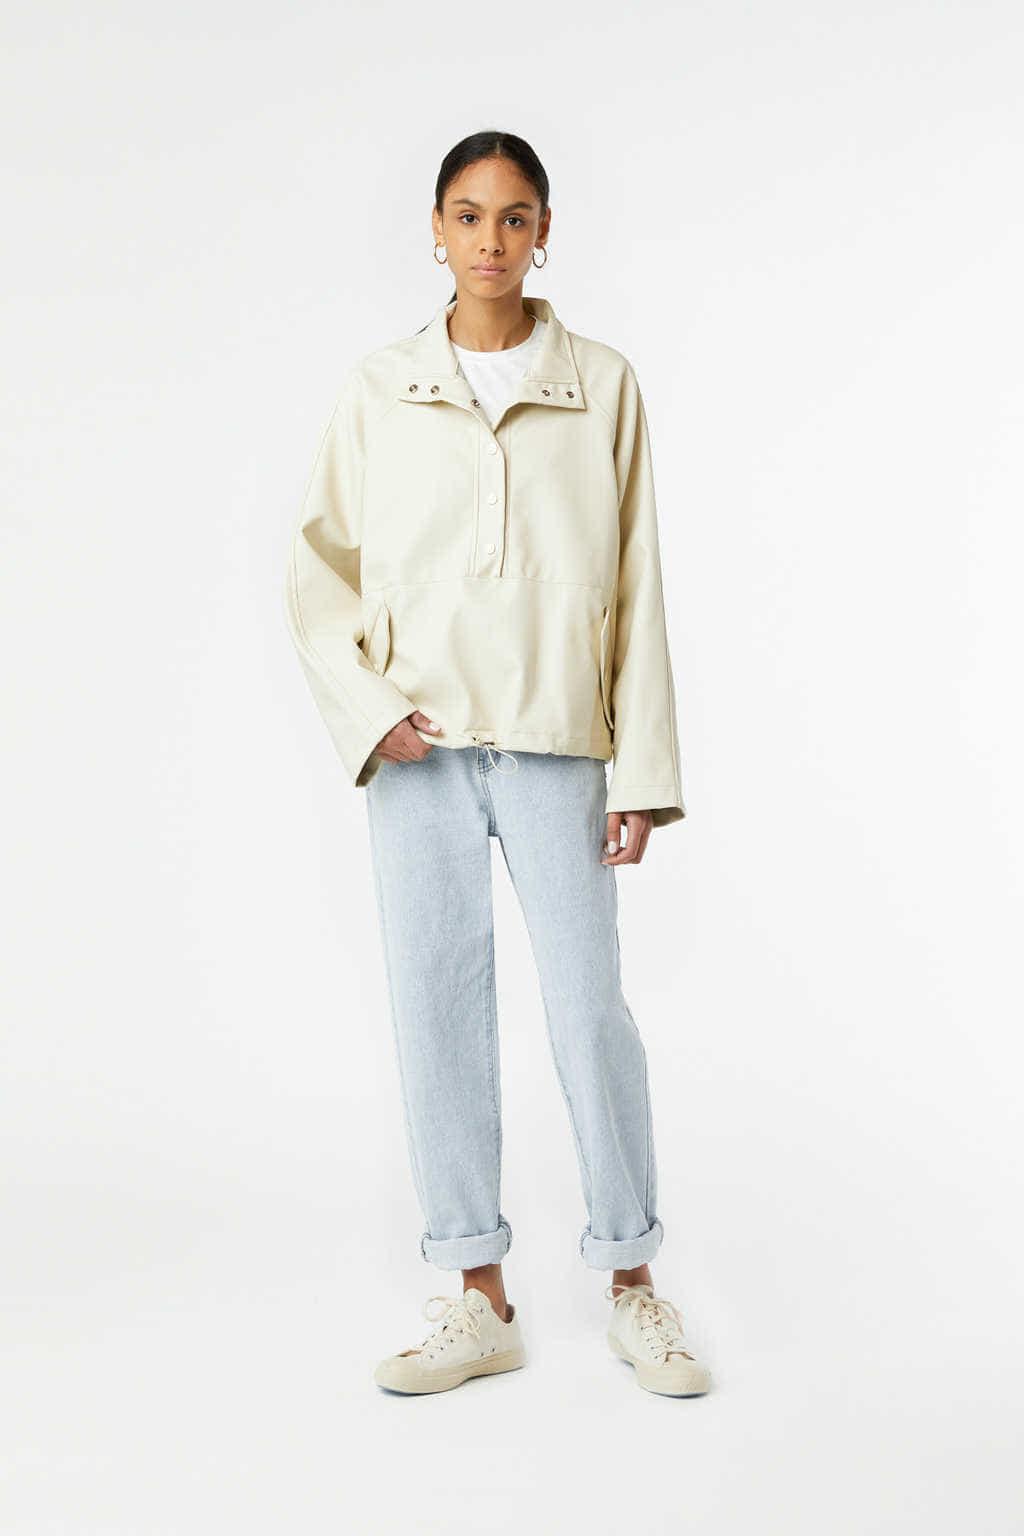 Jacket J001 Cream 3